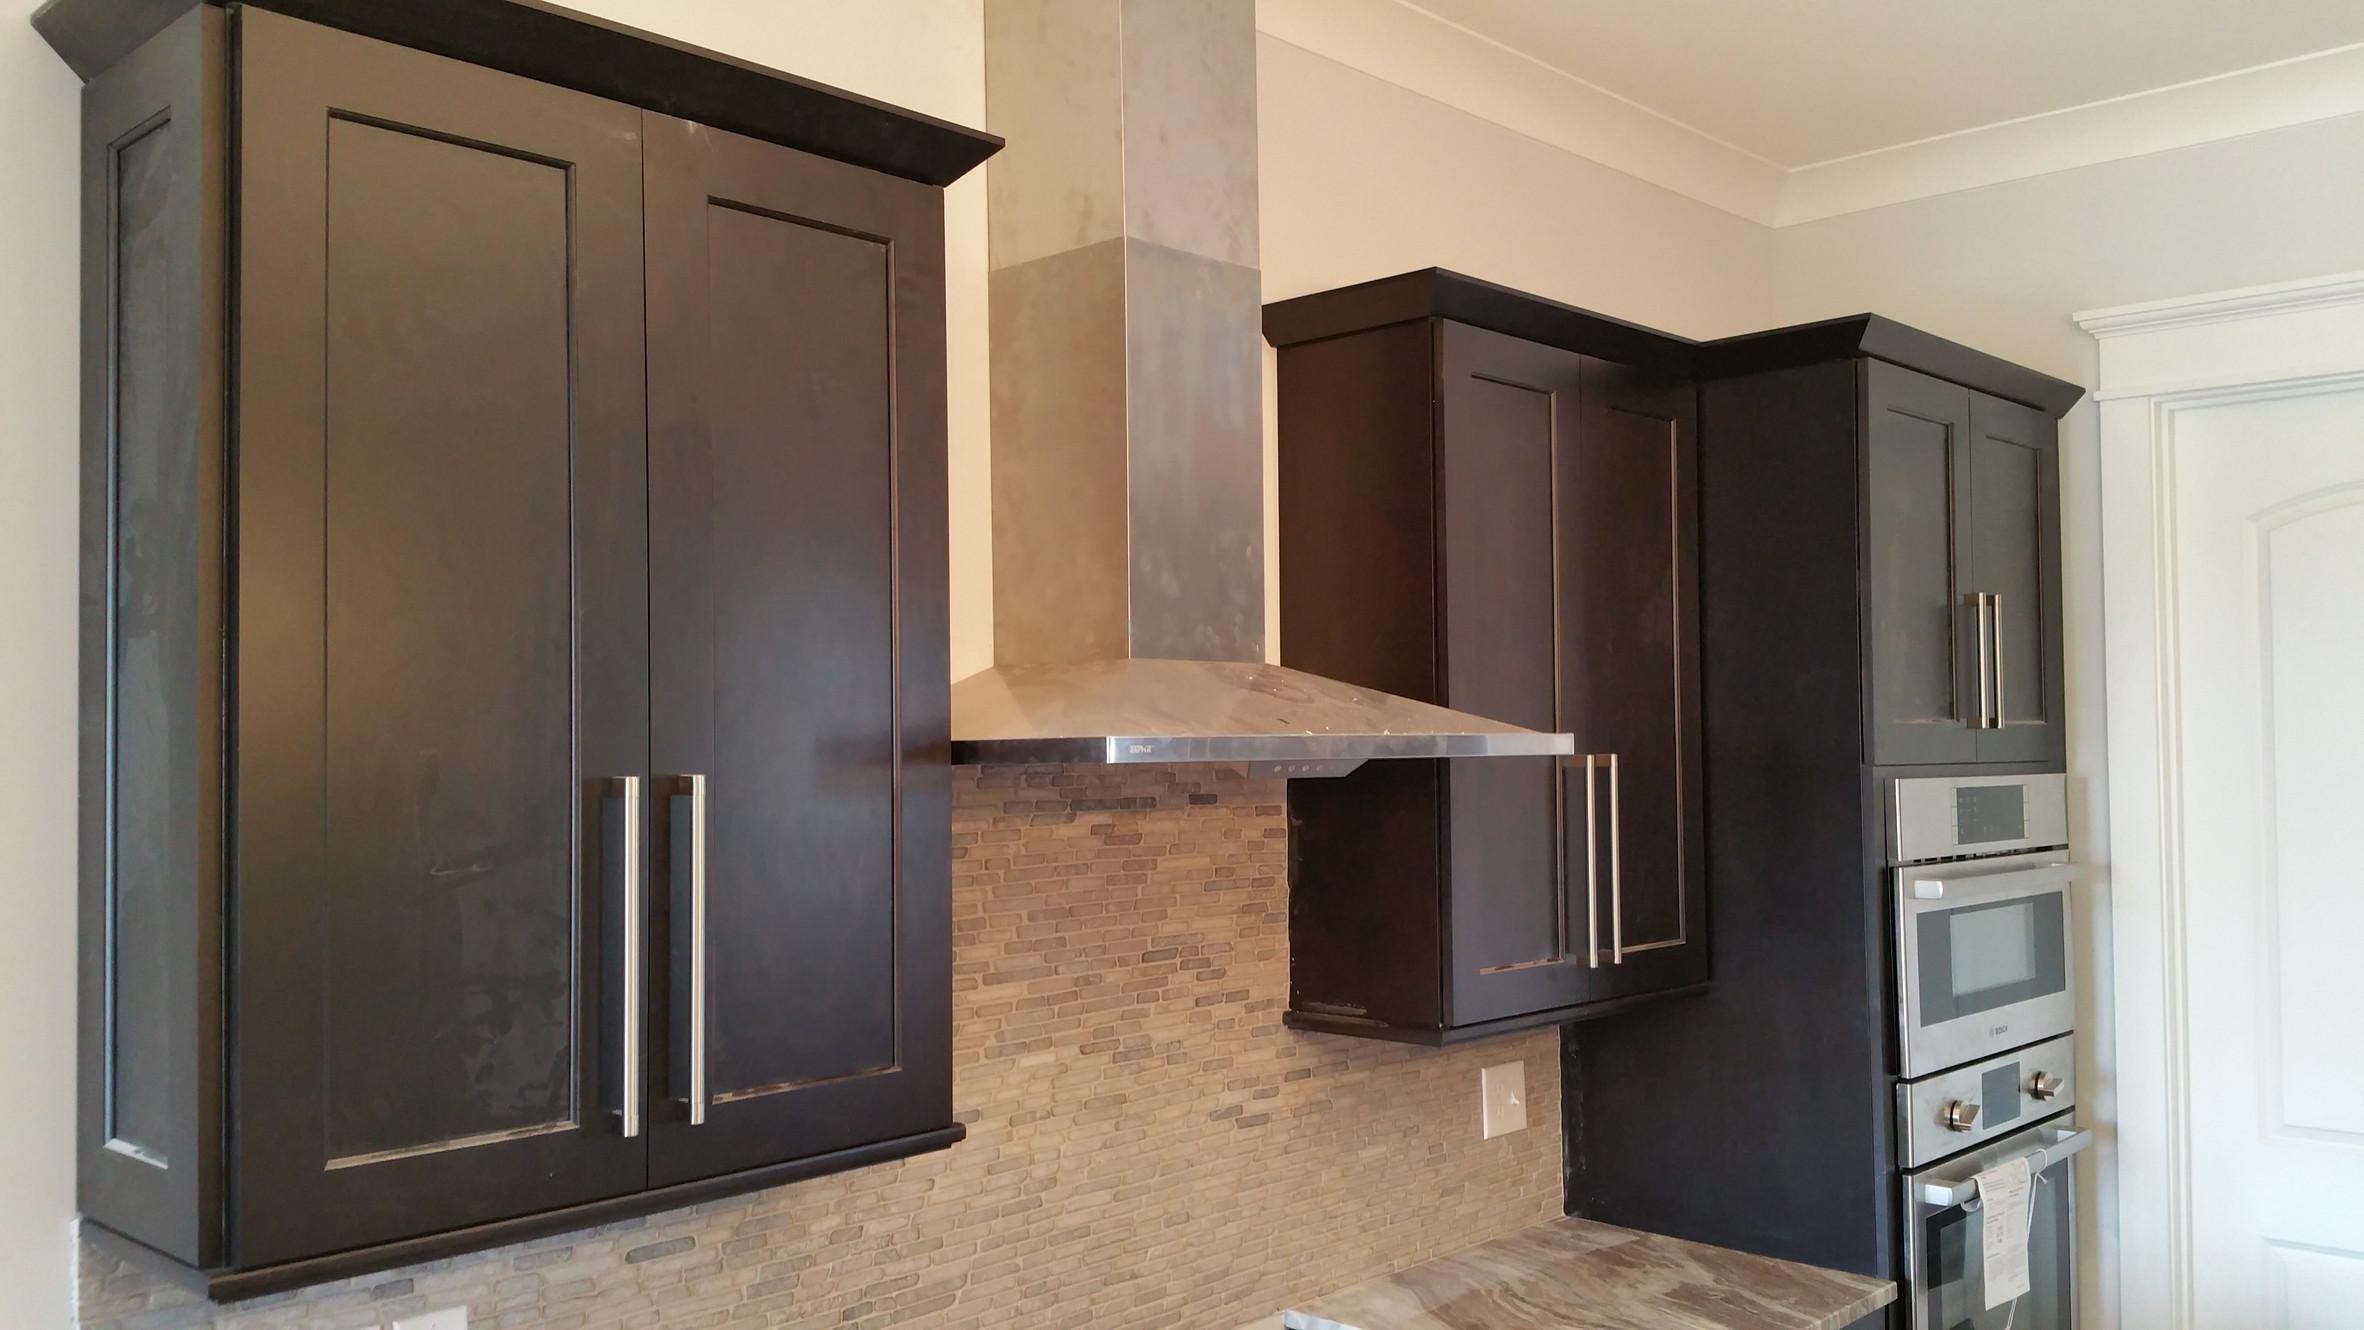 Design phase kitchens baths inc johnson city tn - Designer baths and kitchens germantown tn ...